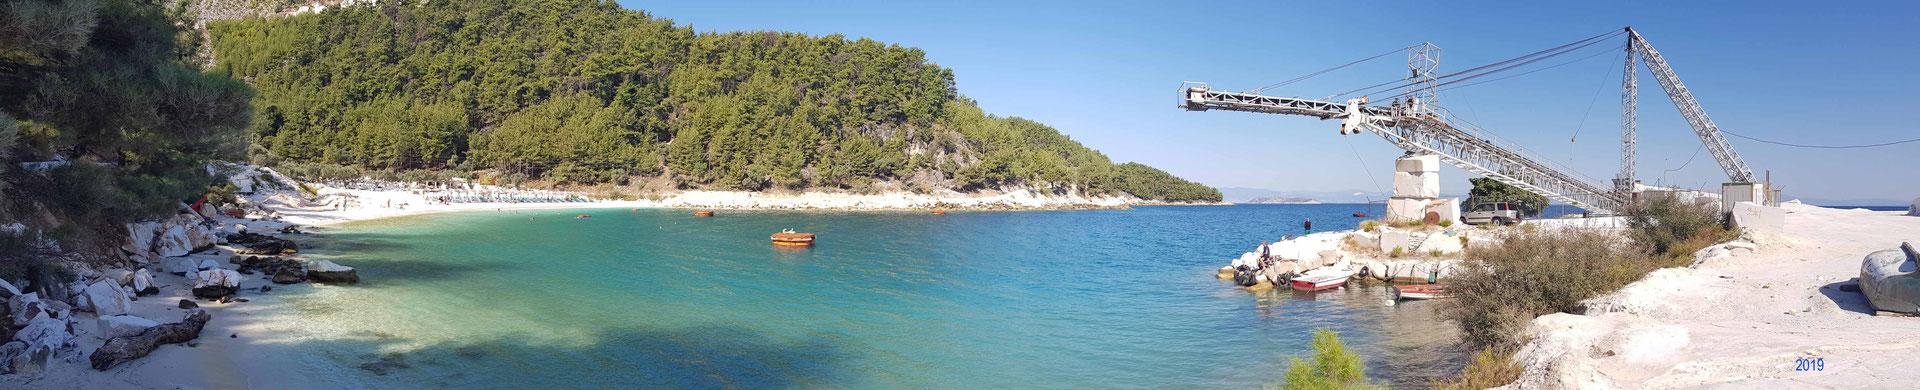 Porto Vathy Beach - Πόρτο Βαθύ